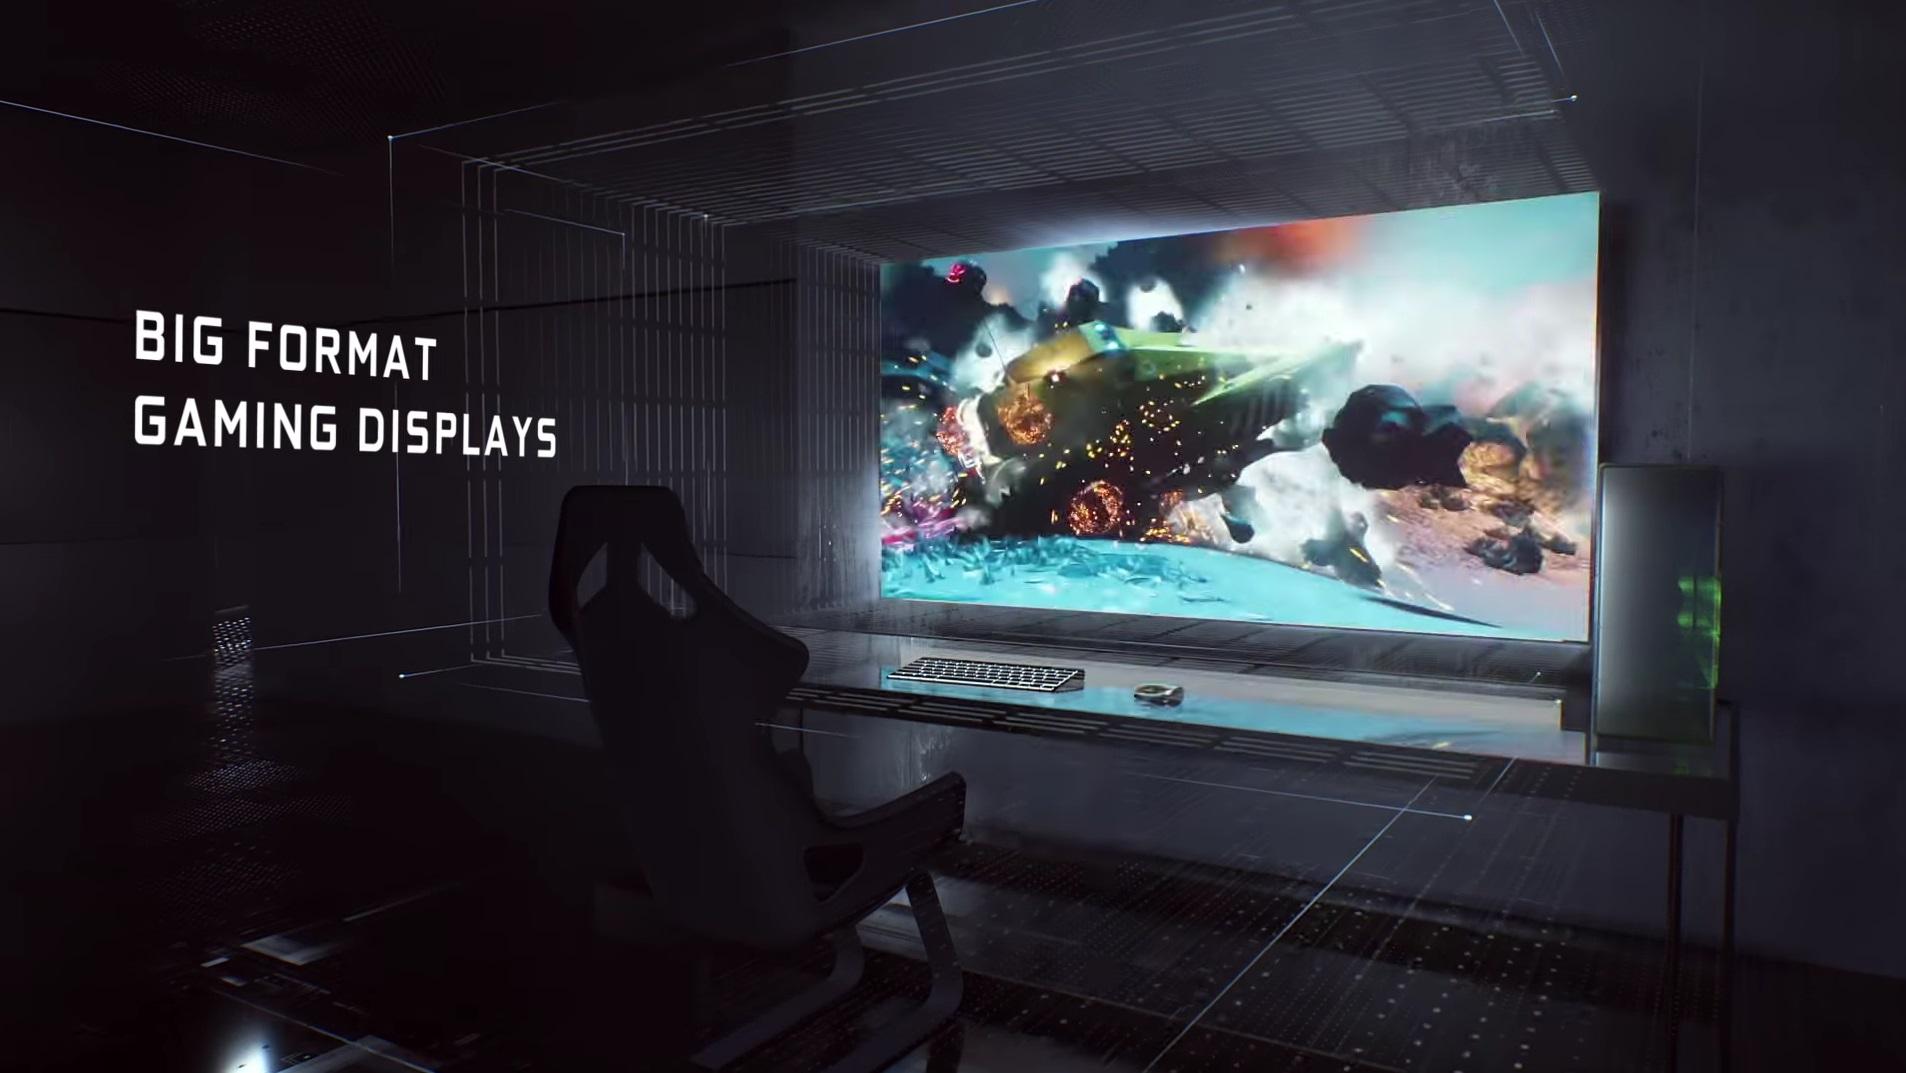 BFGD: Nvidia bringt riesige 65-Zoll-Monitore für Gamer